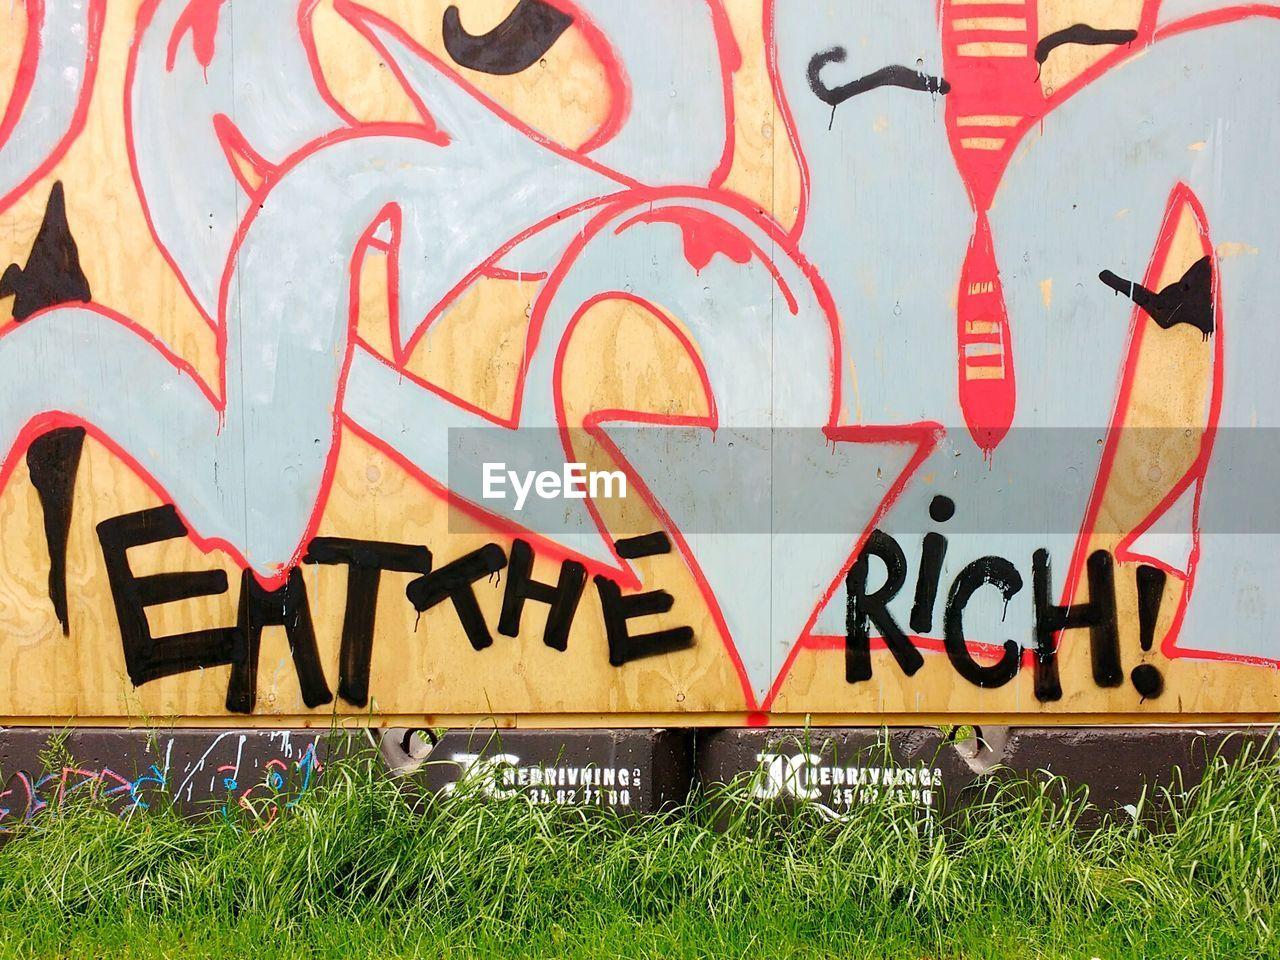 text, graffiti, communication, day, outdoors, no people, grass, architecture